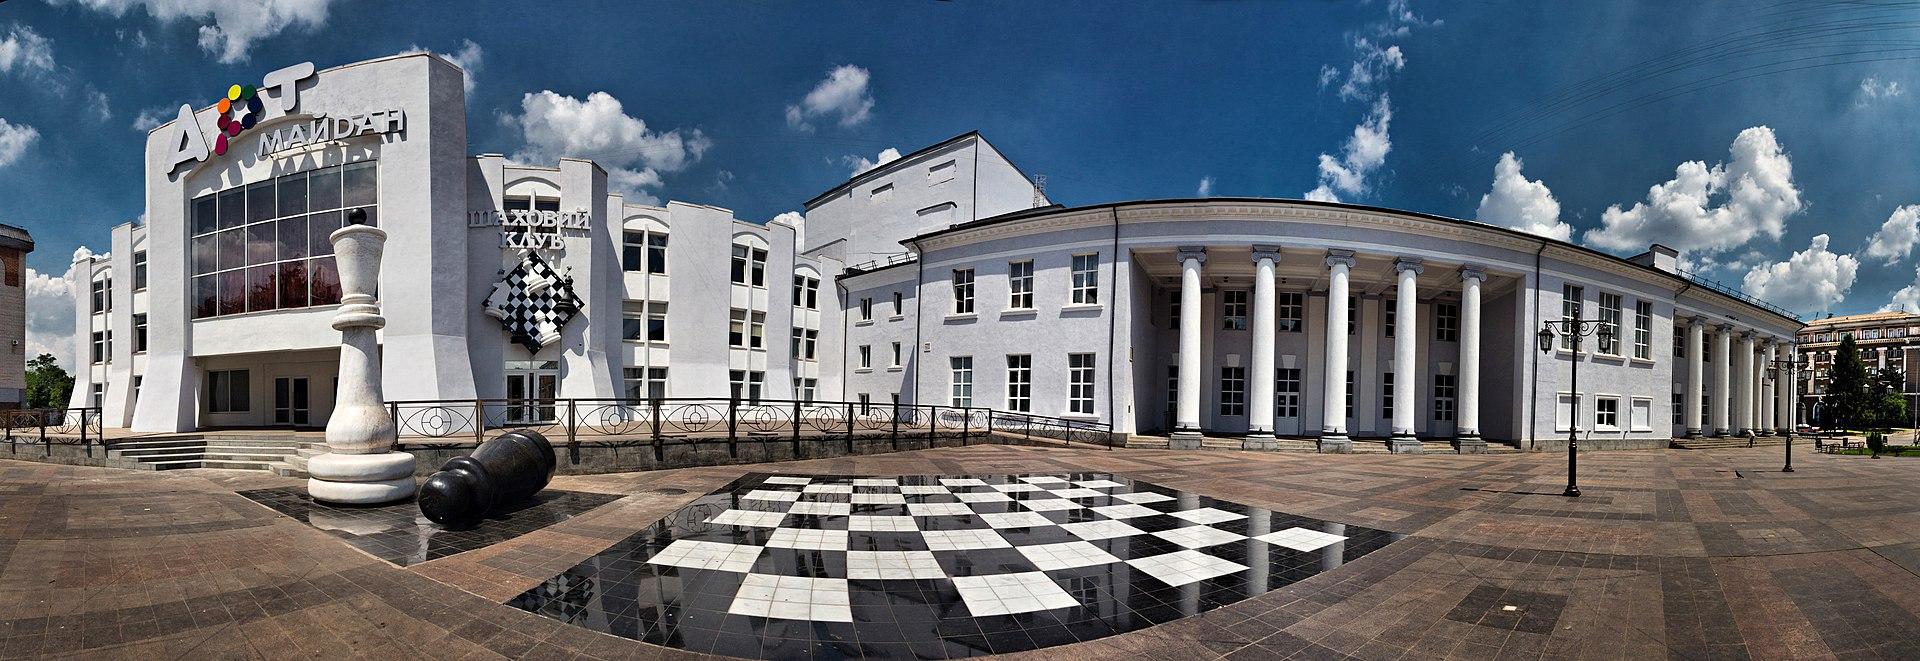 Площадь «Арт-Майдан»